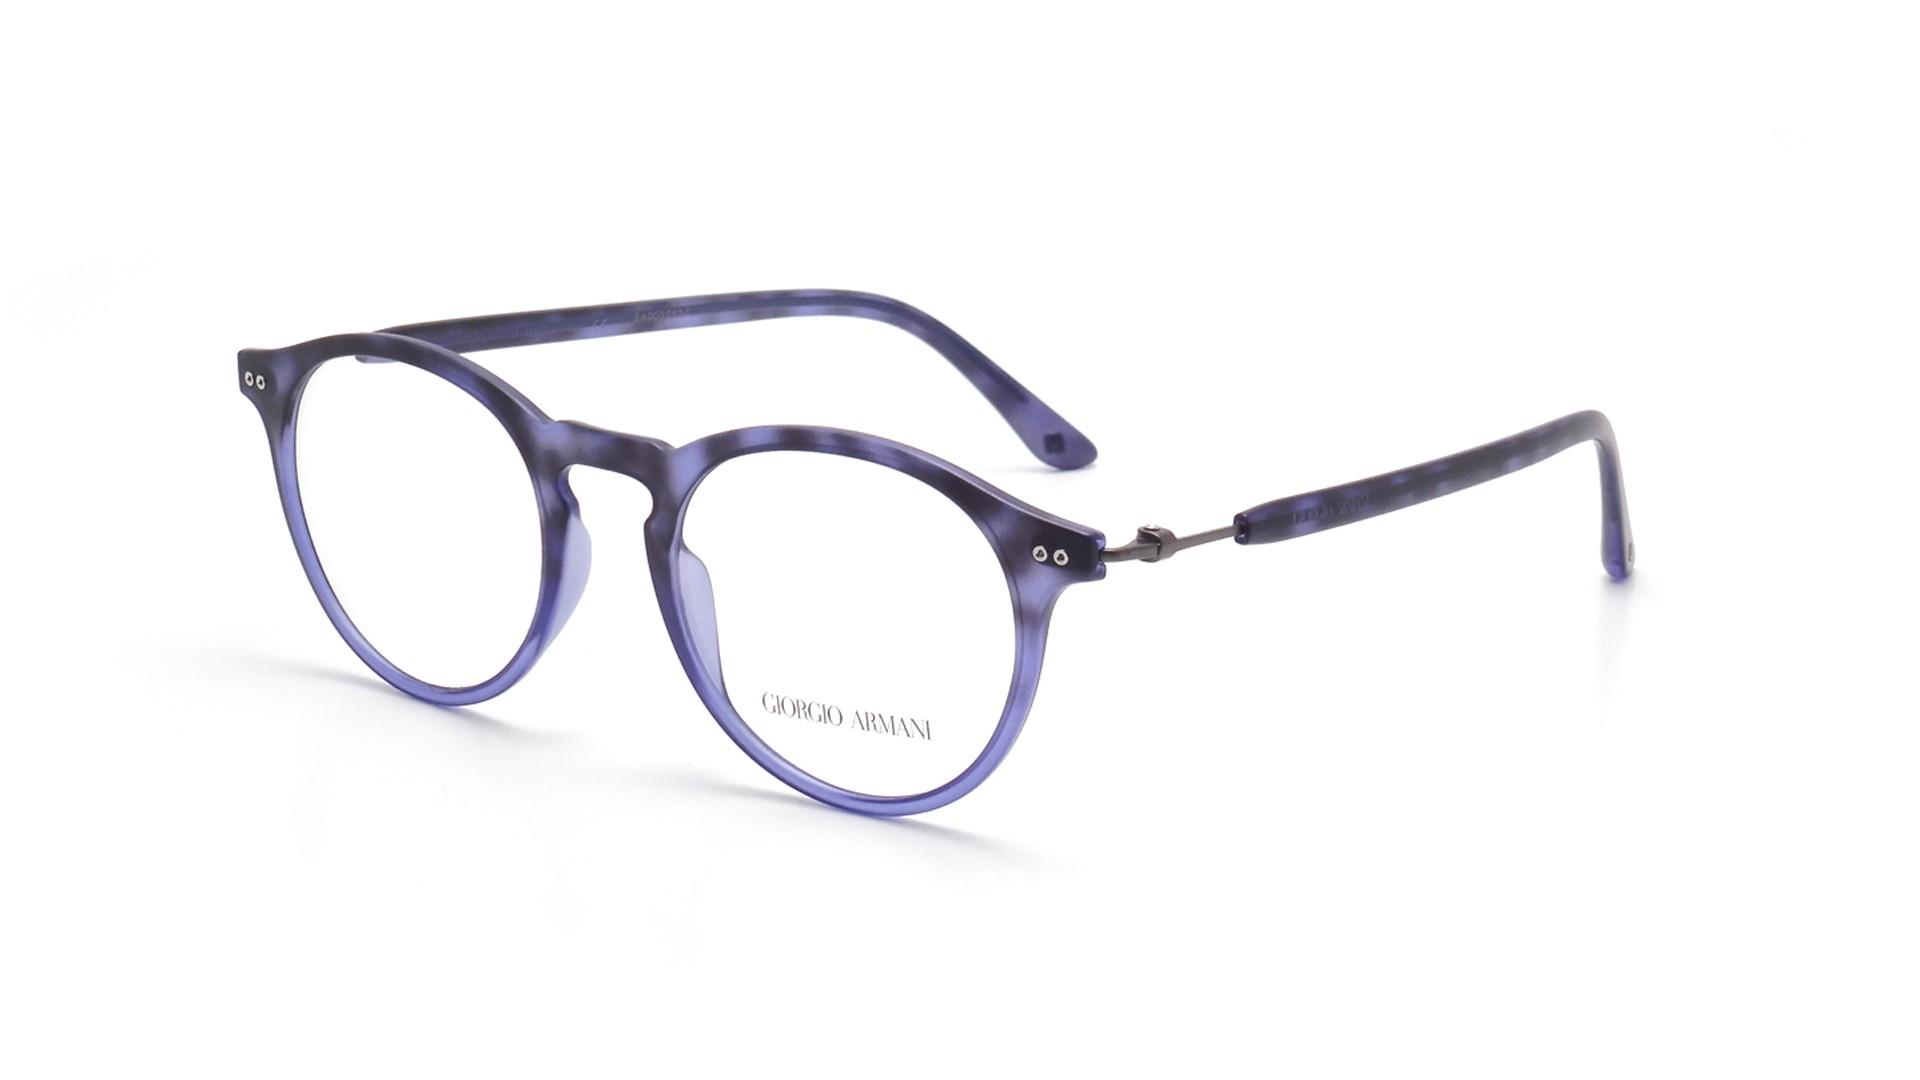 Armani Glasses Frames Blue : Giorgio Armani Frames of Life Blue AR7040 5313 48-19 ...